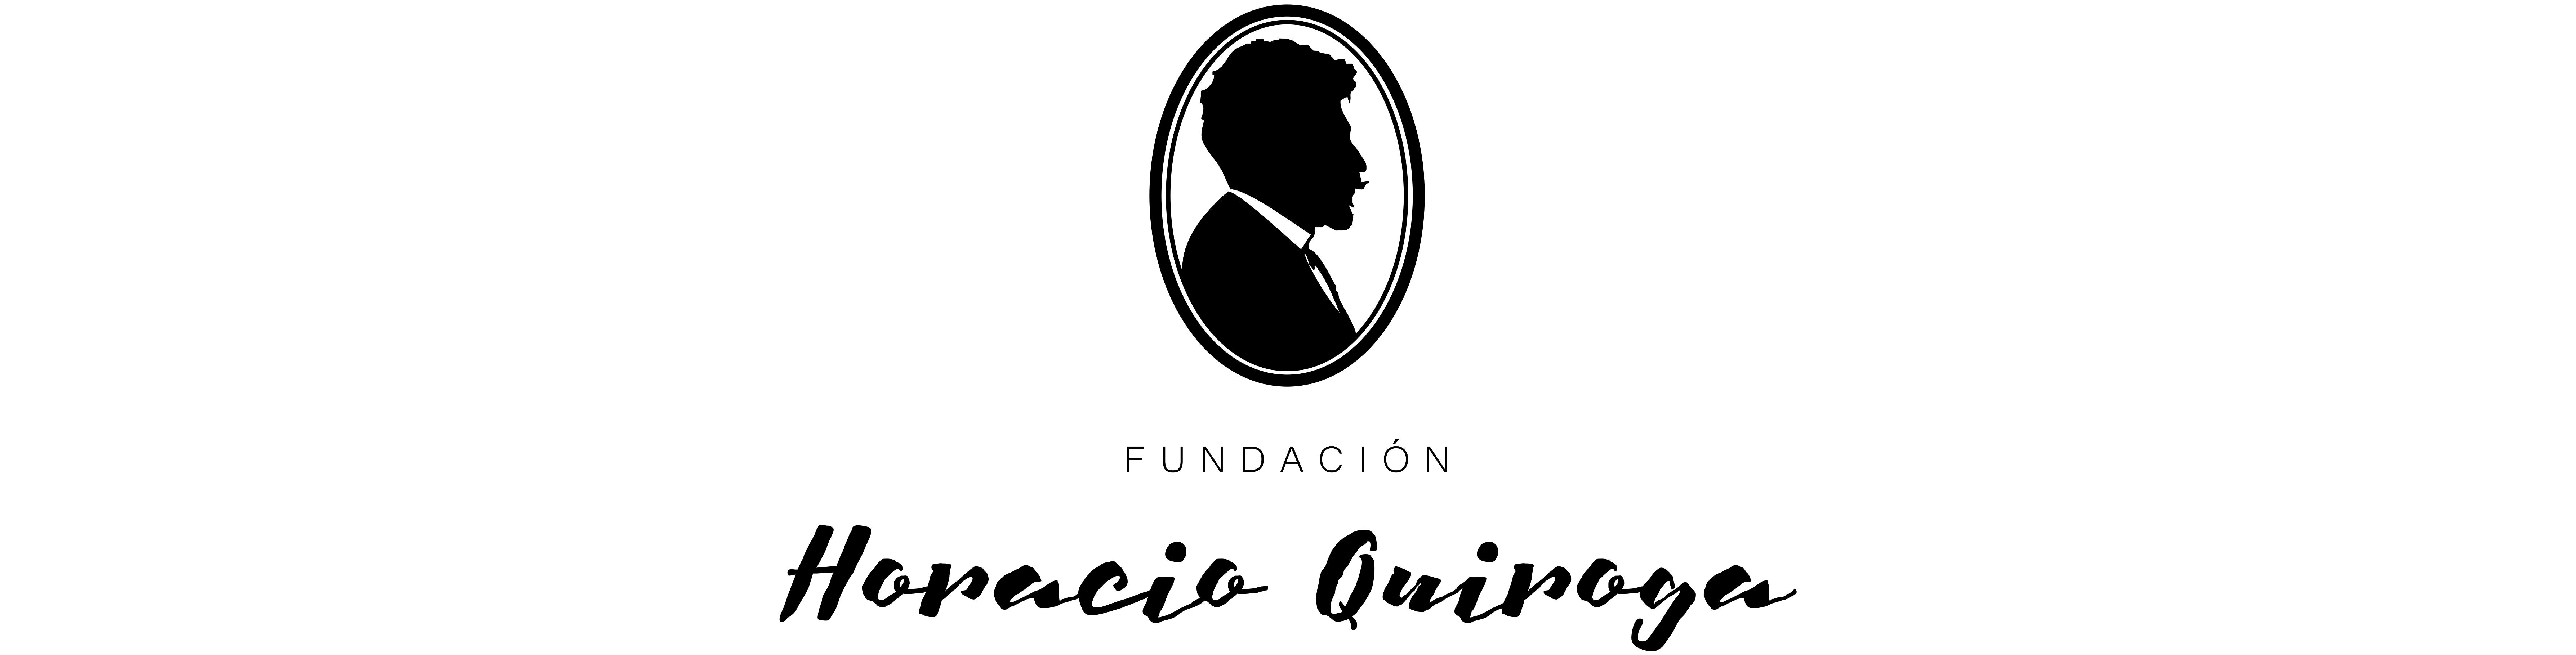 Fundación Horacio Quiroga